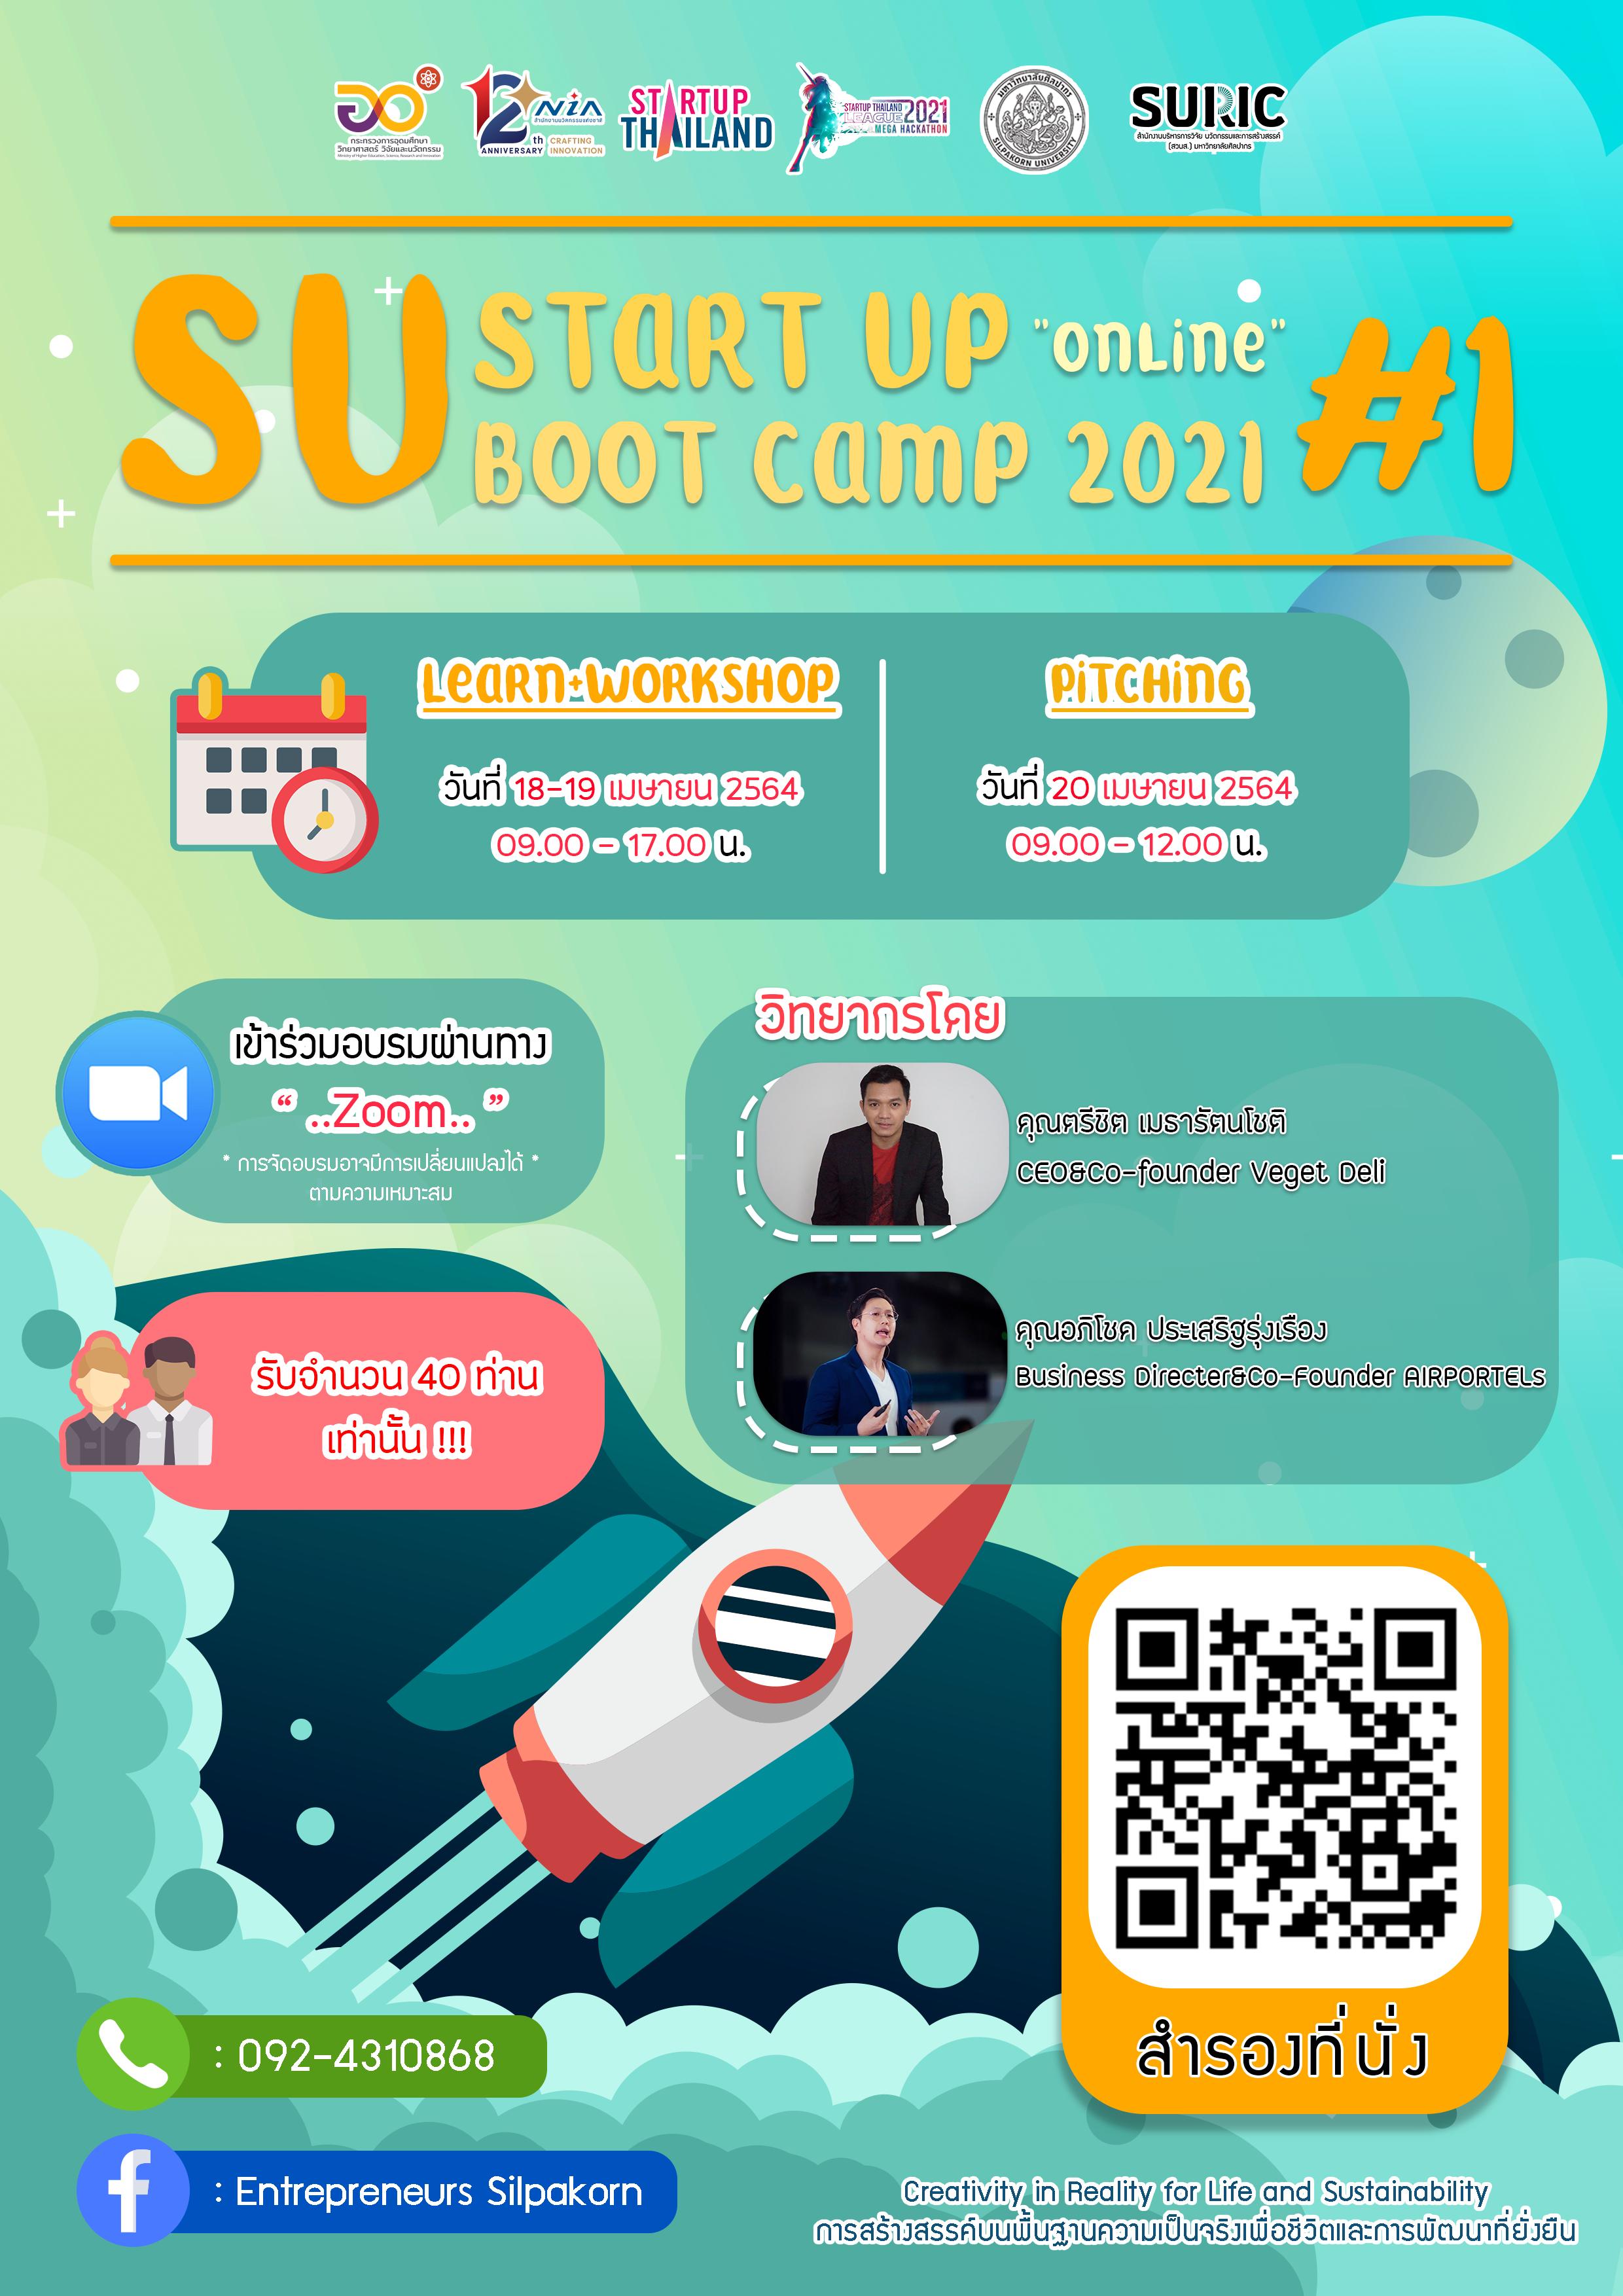 SU Startup Boot Camp Online 2021 # 1